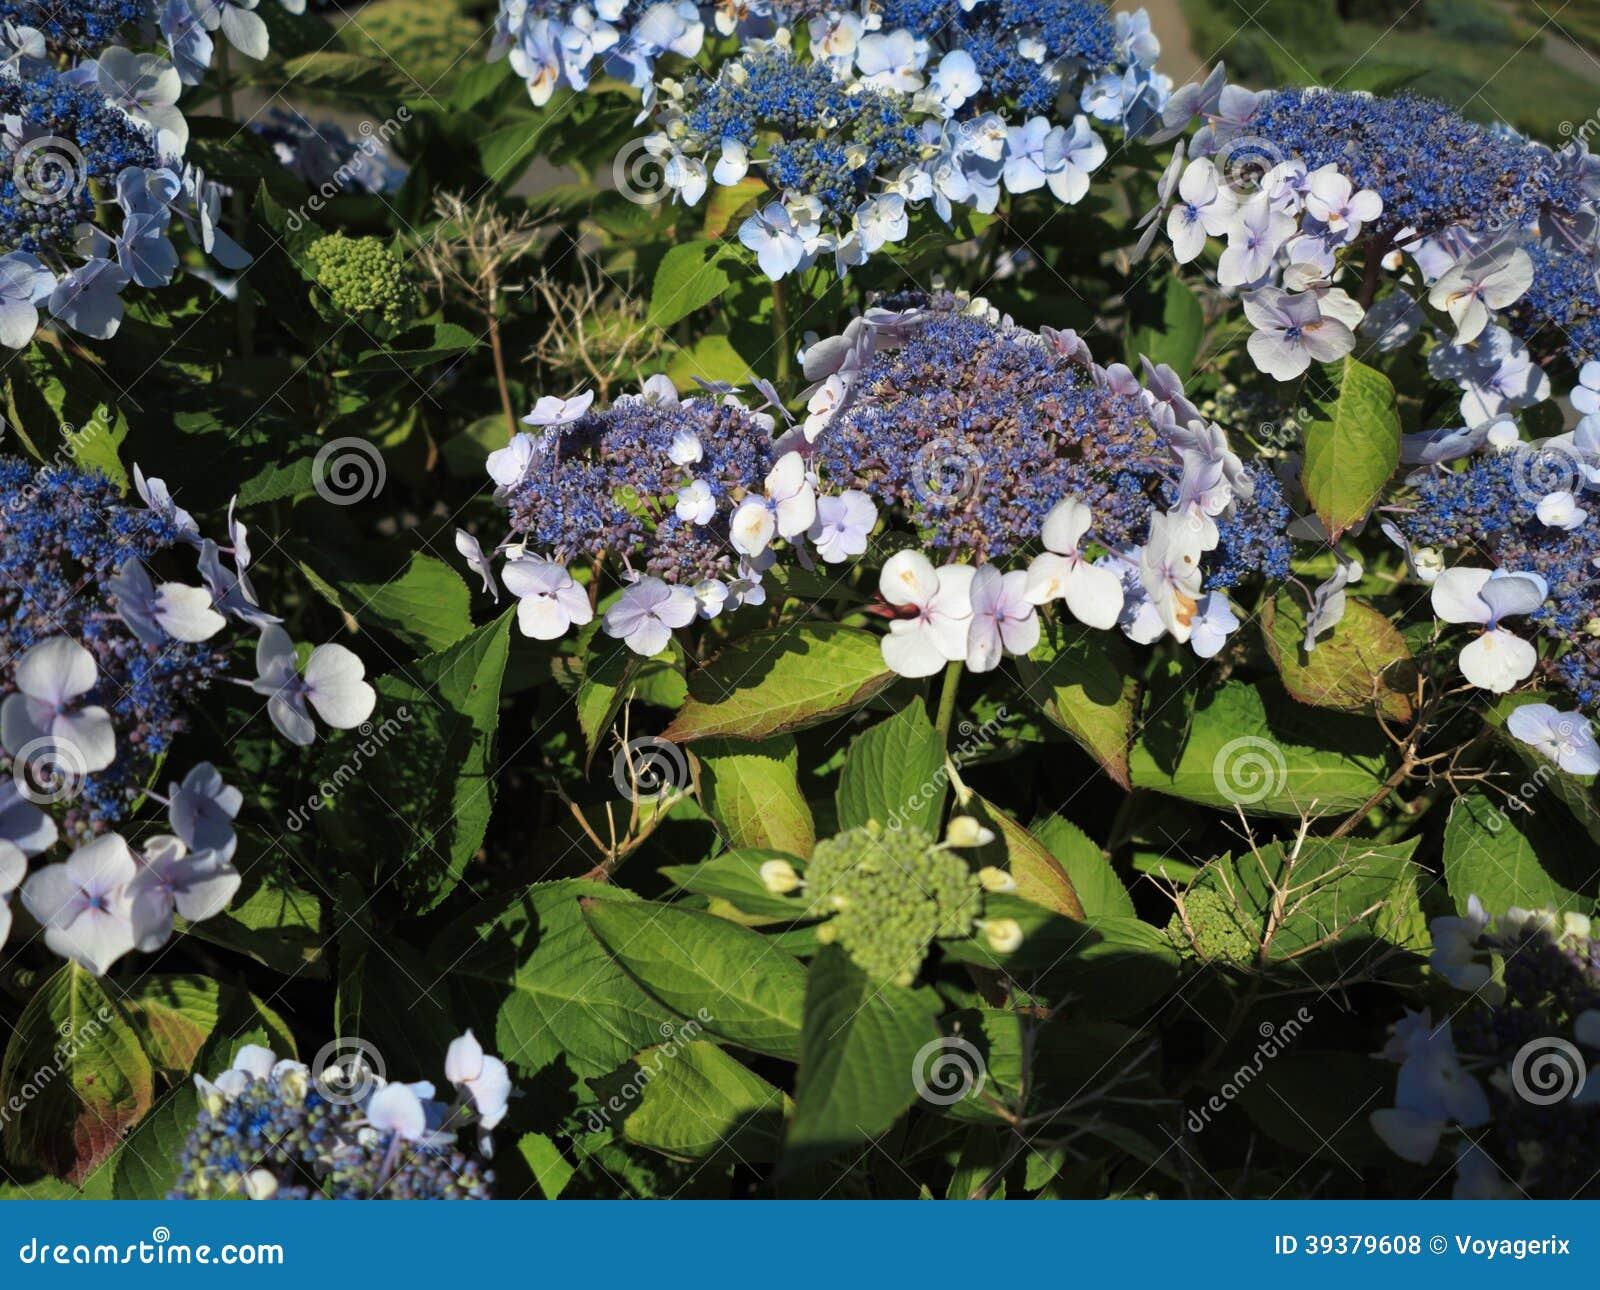 hydrangea aspera macrophylla hortensia flowers stock photo. Black Bedroom Furniture Sets. Home Design Ideas